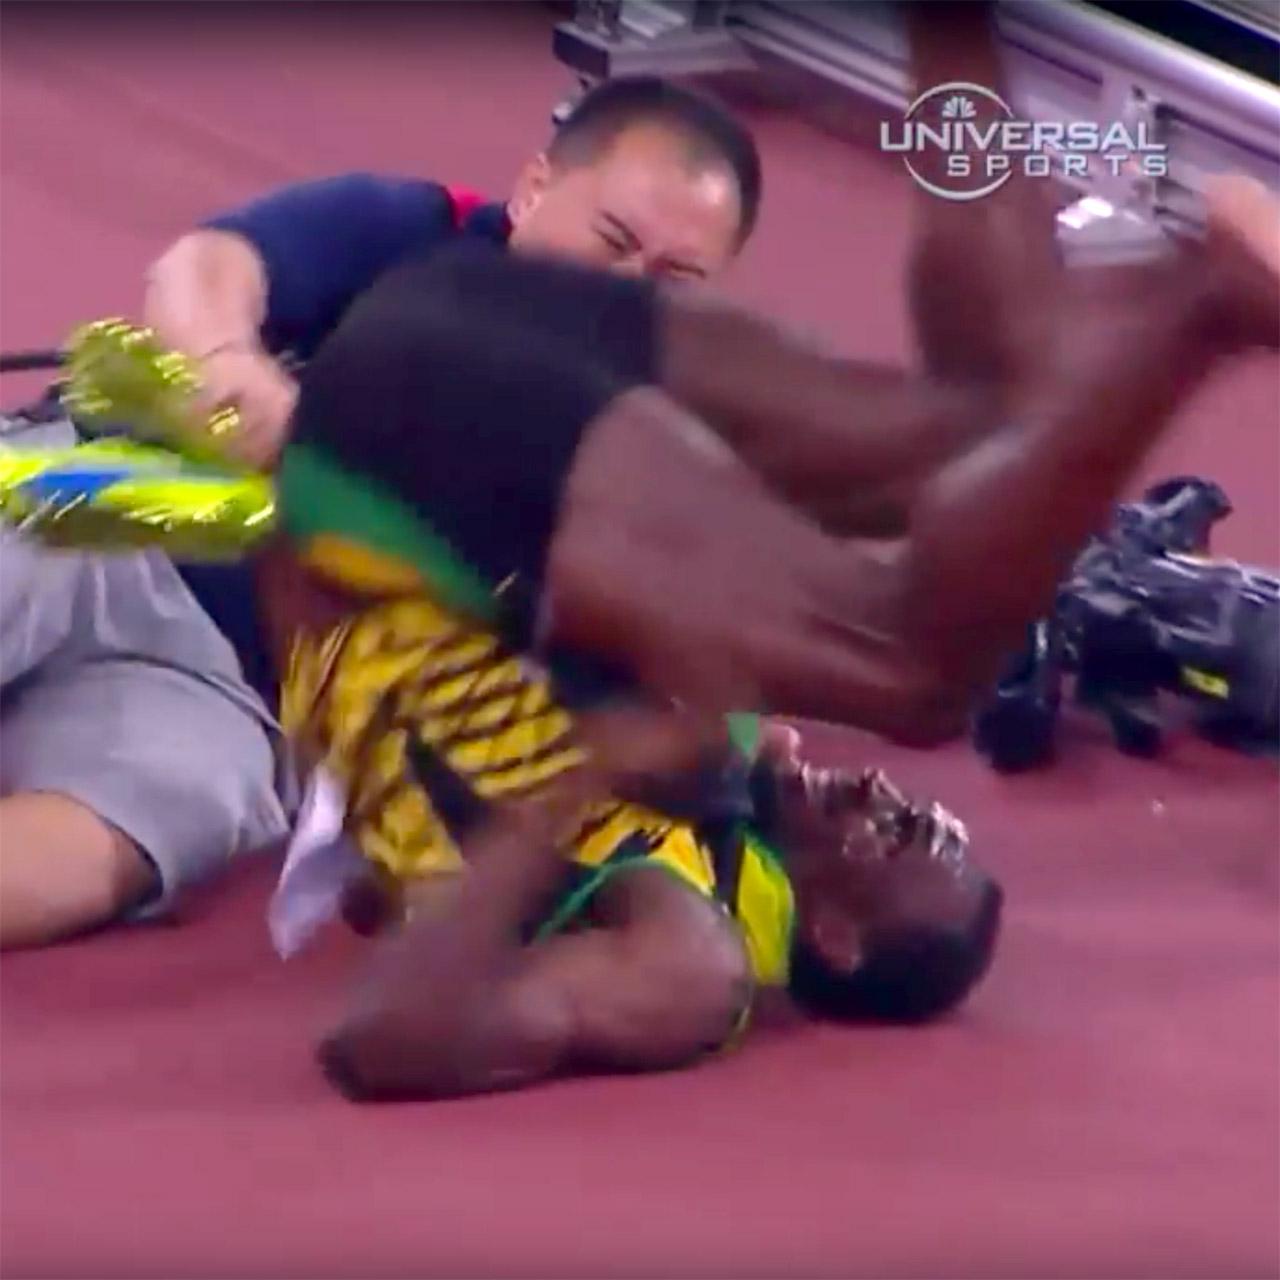 Usain Bolt taken out by cameraman's Segway